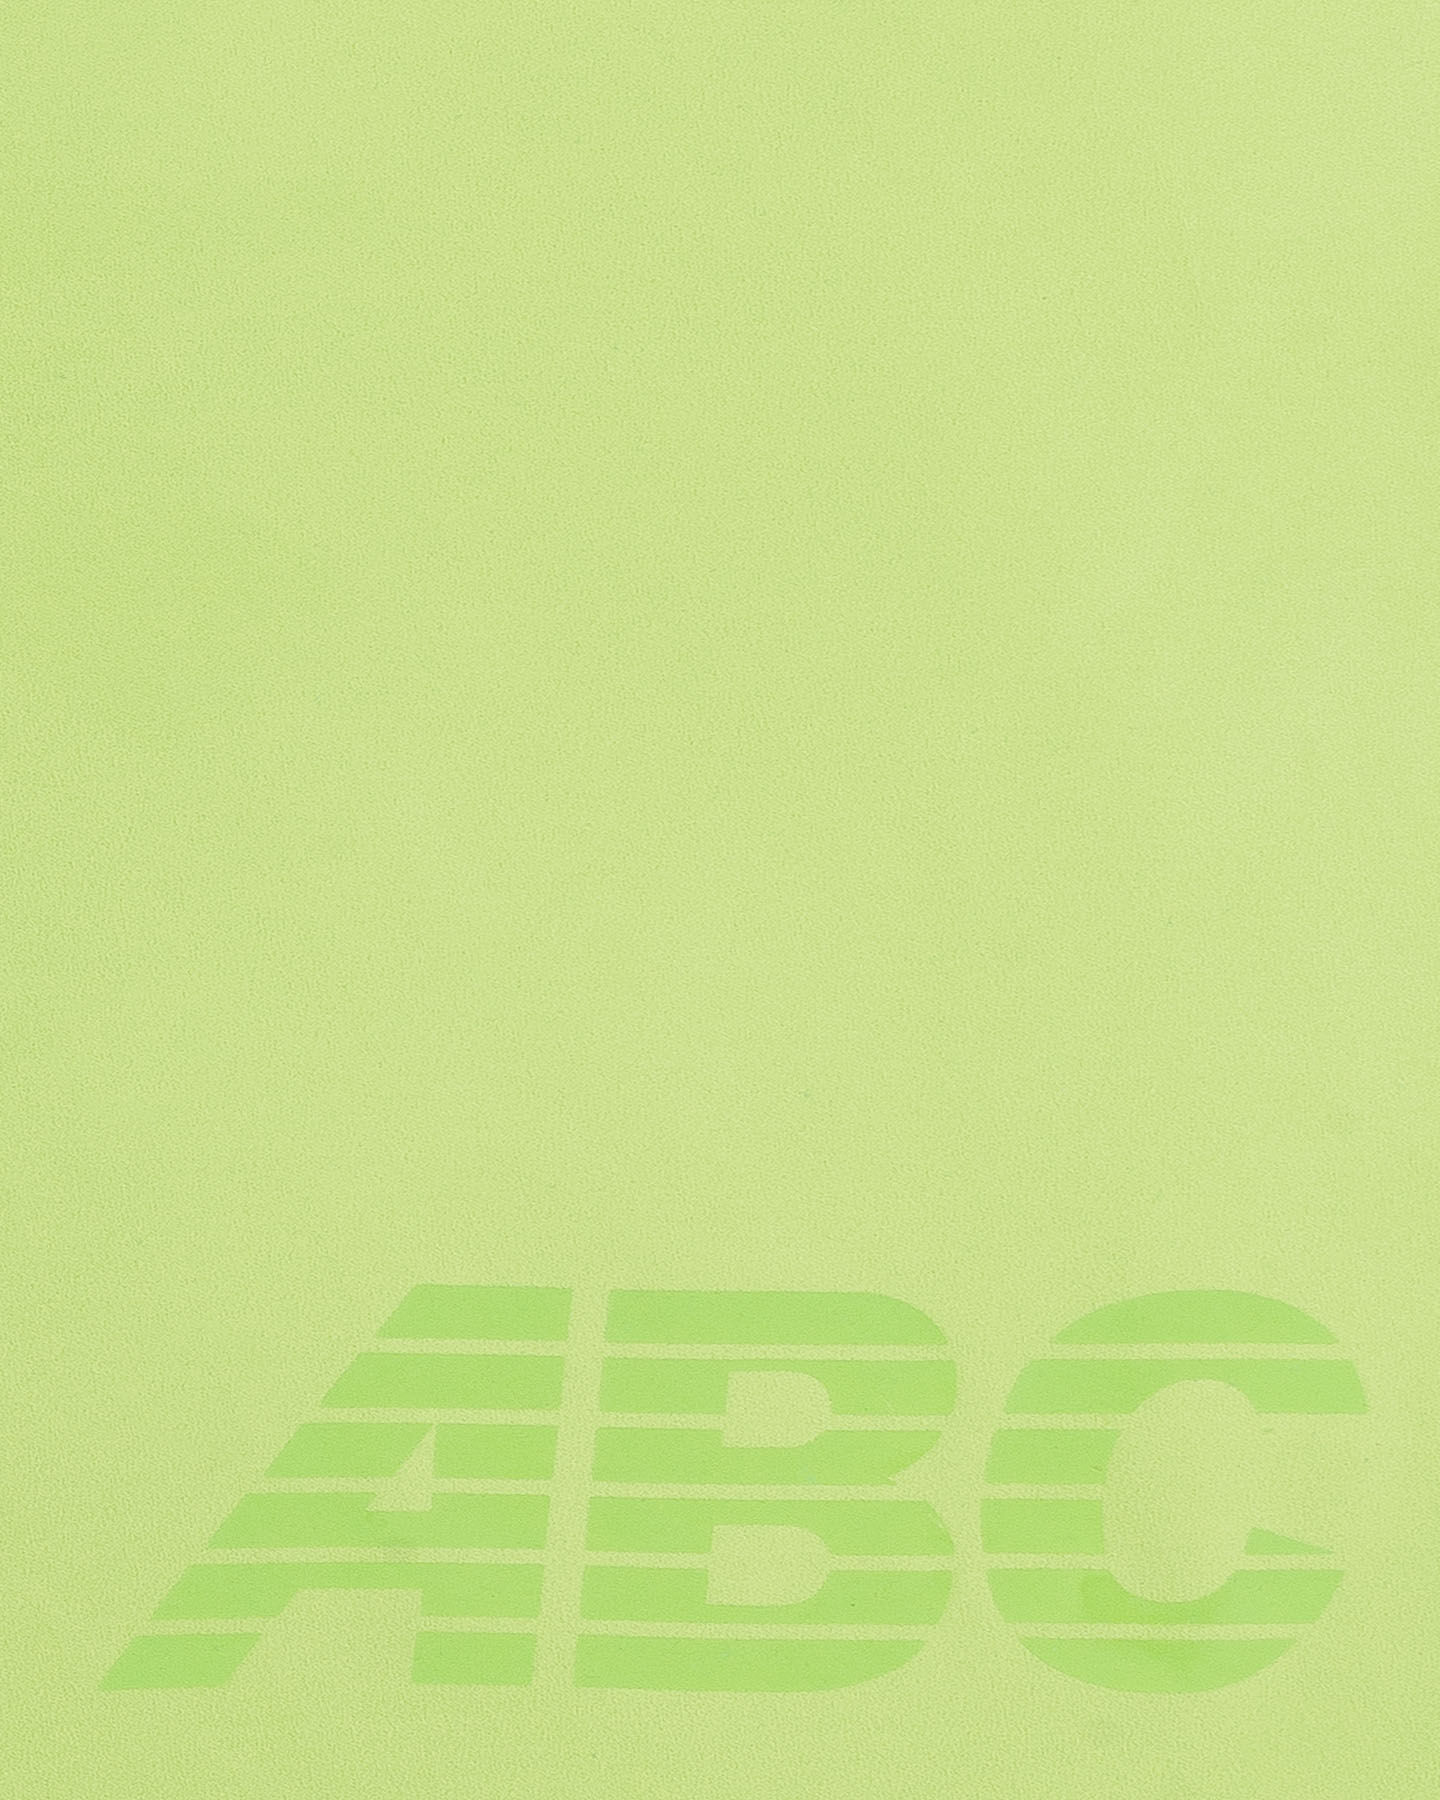 Telo ABC BASIC MICROFIBER 150X100 S4069042 scatto 2